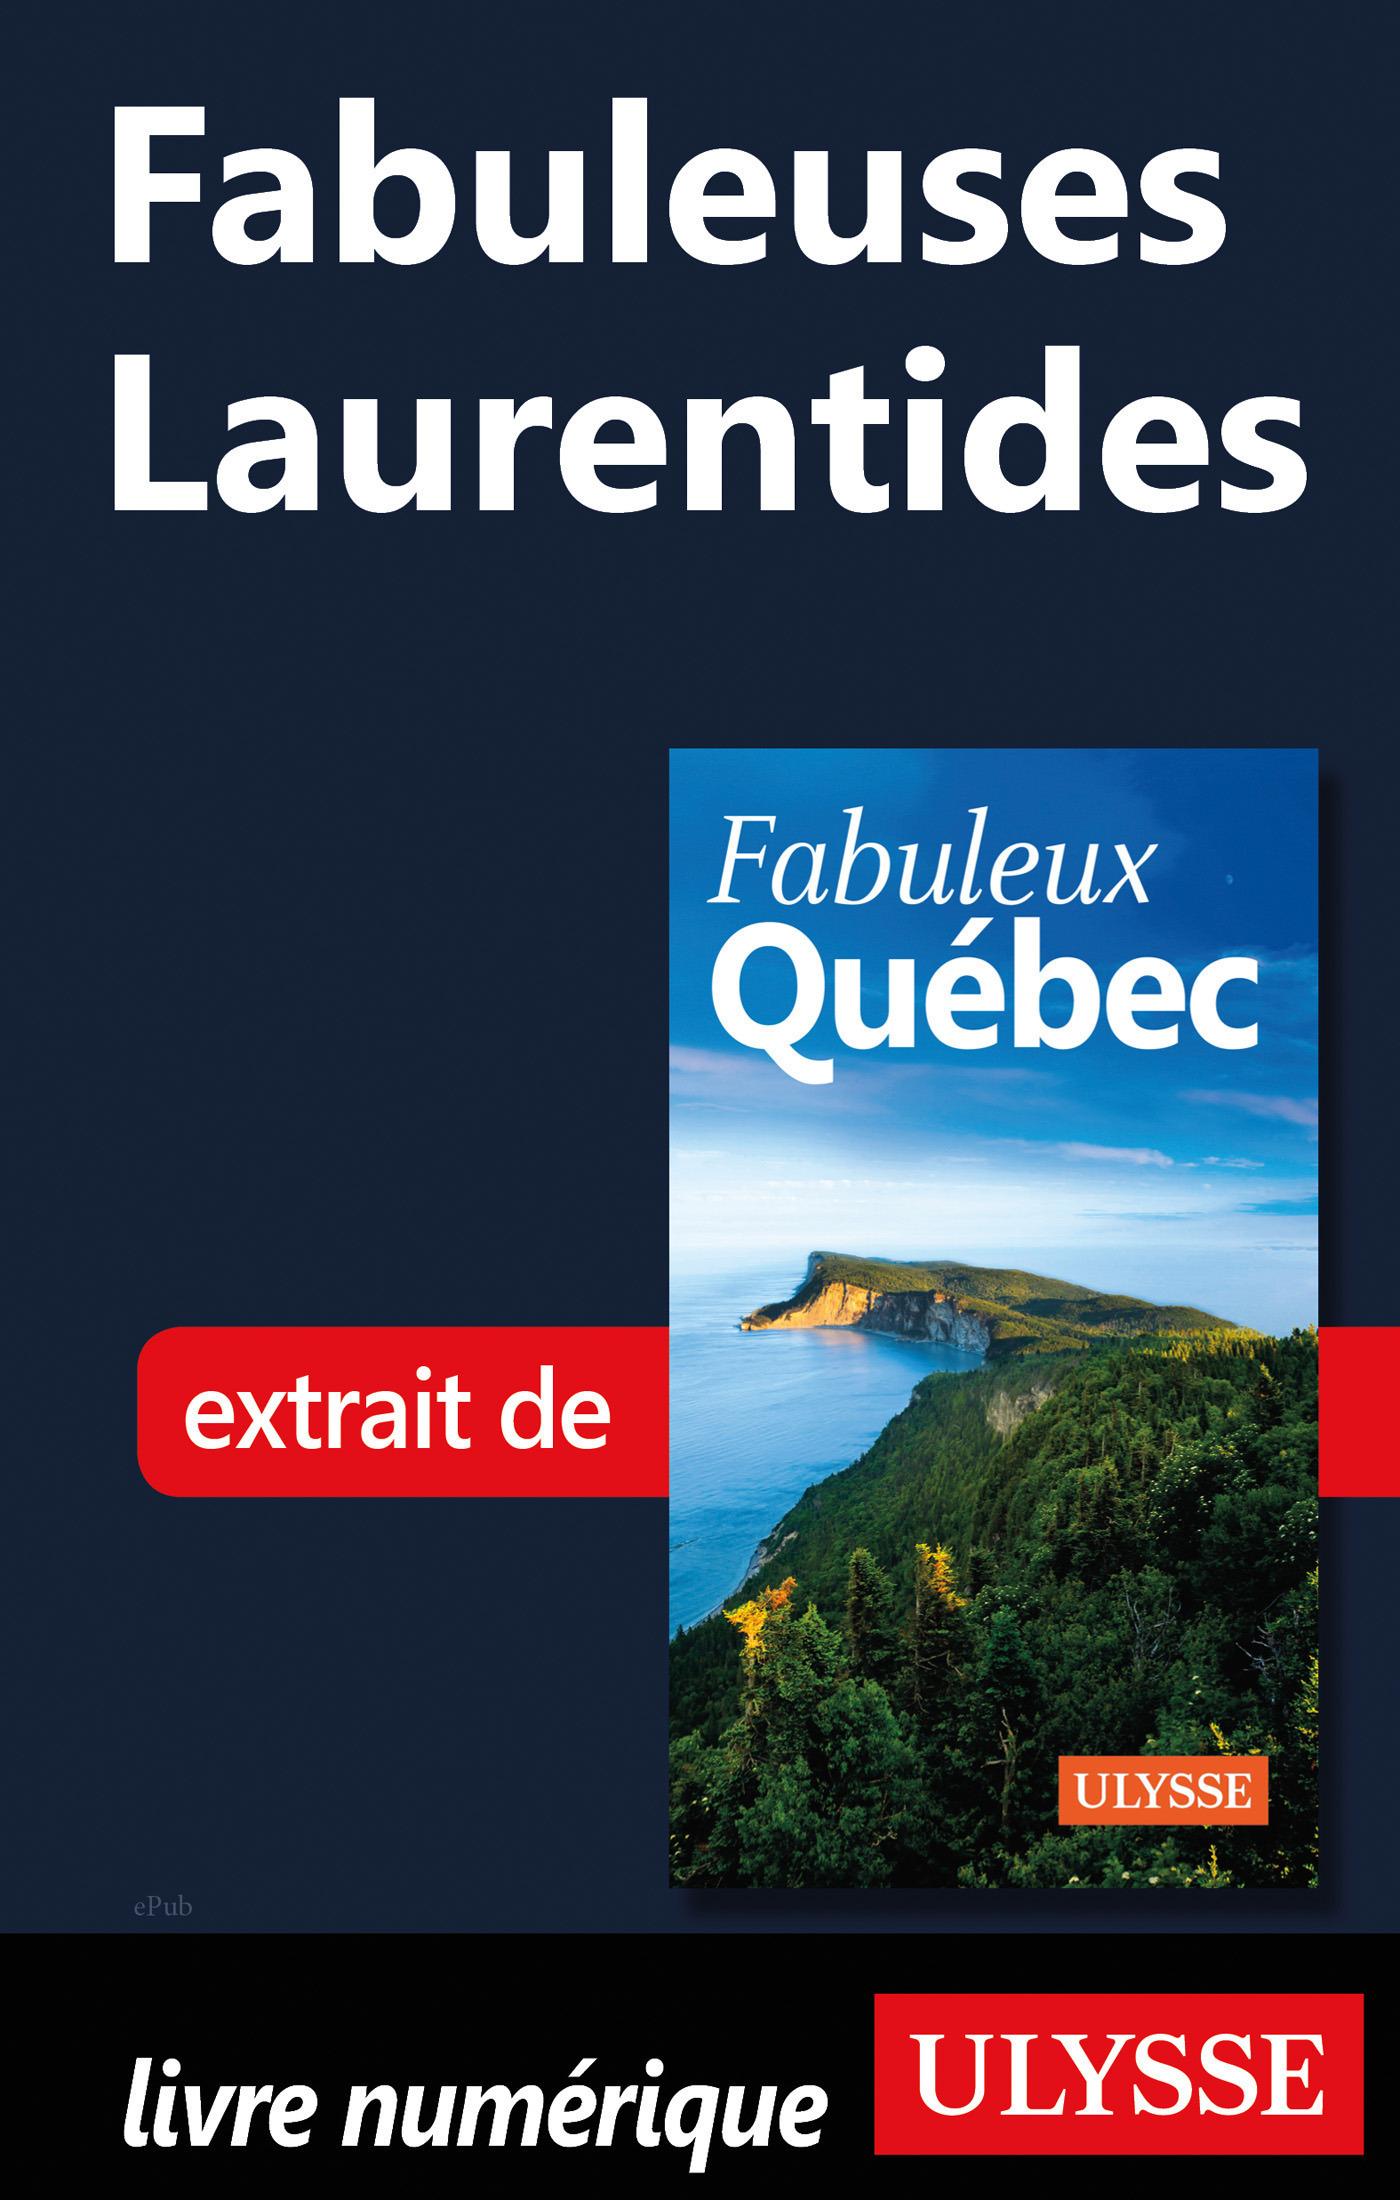 Fabuleuses Laurentides